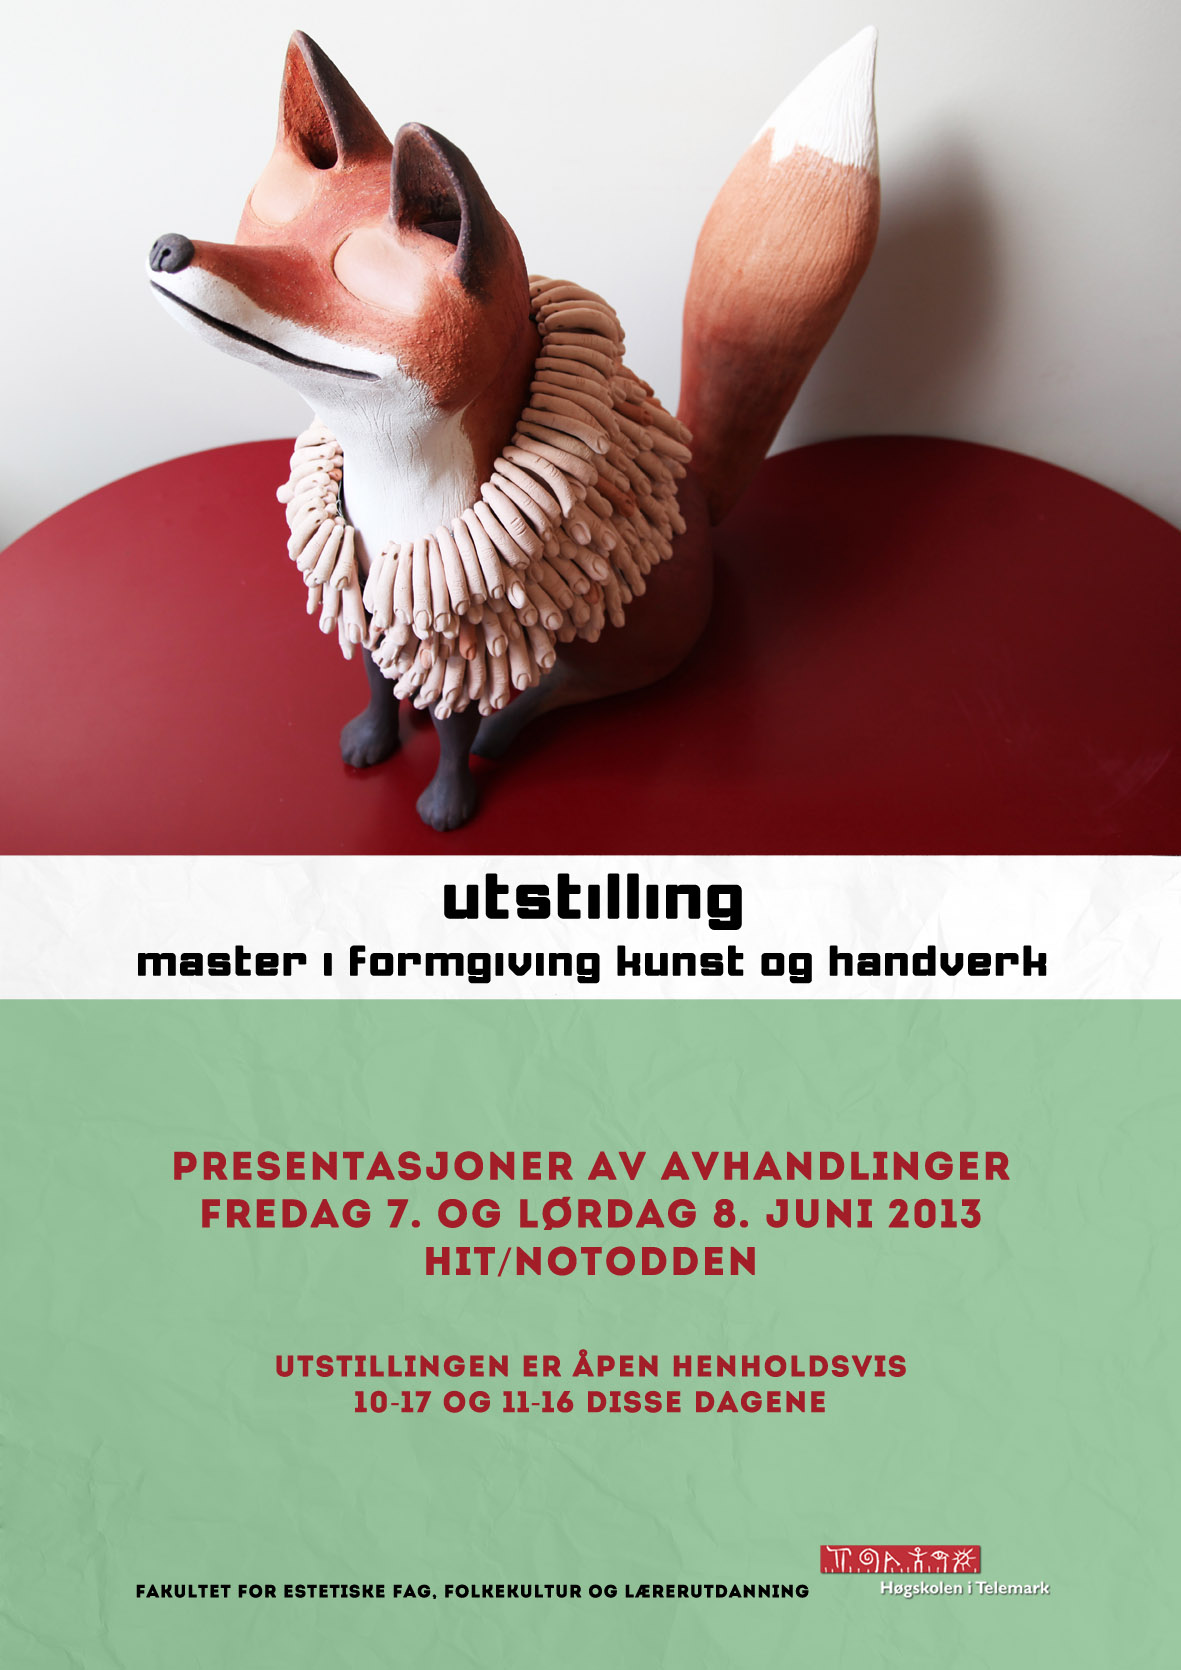 Masterutstilling 2013